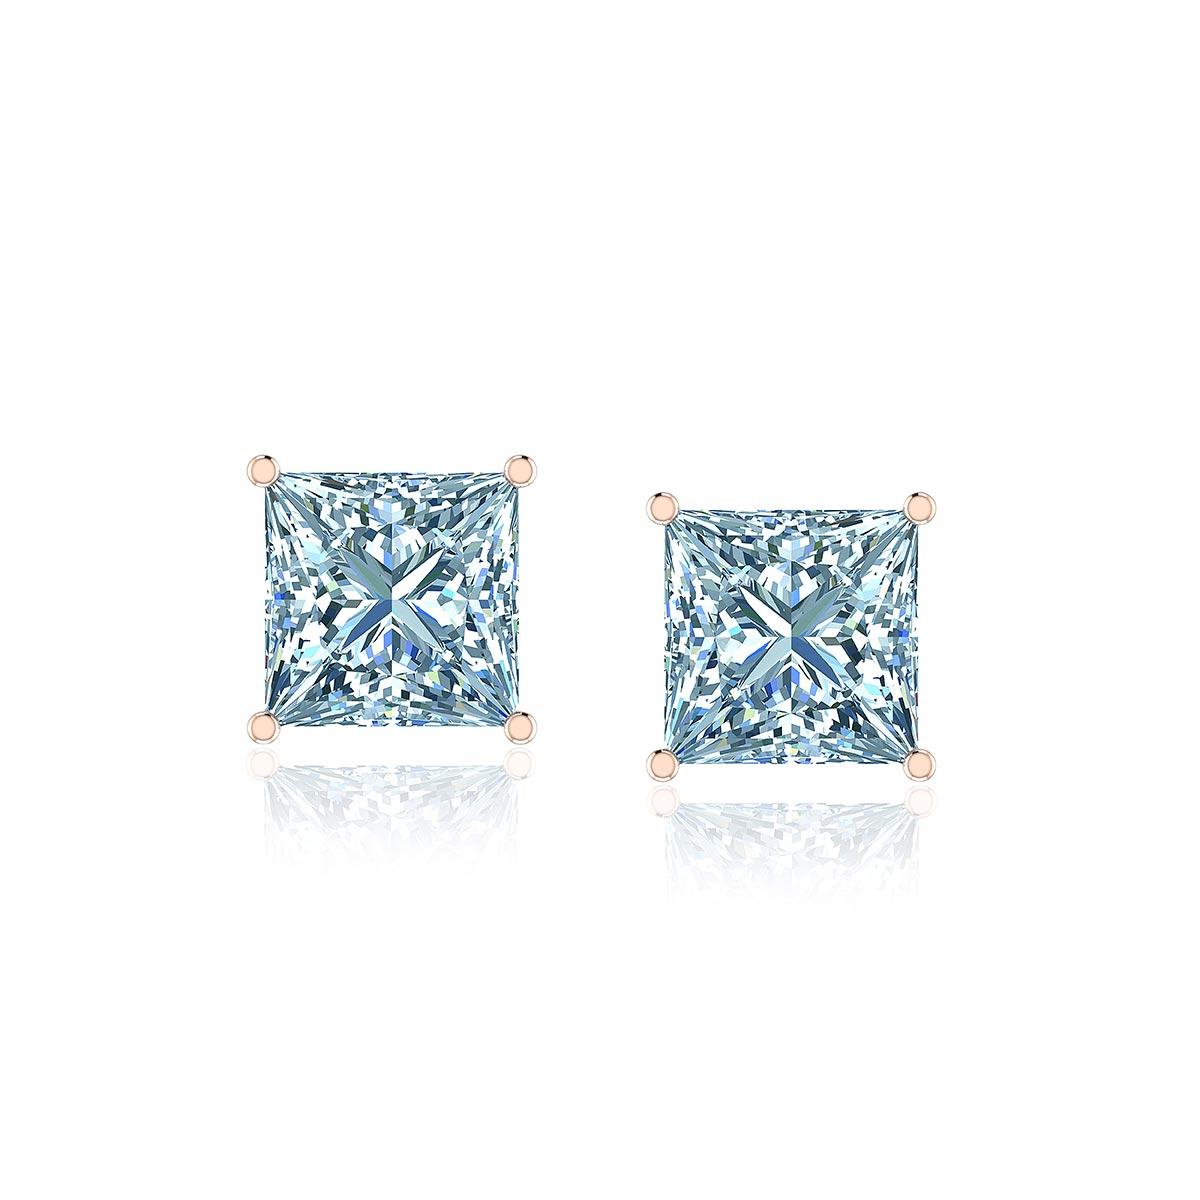 Westerlund Diamond Earrings  (1 CT. TW.)